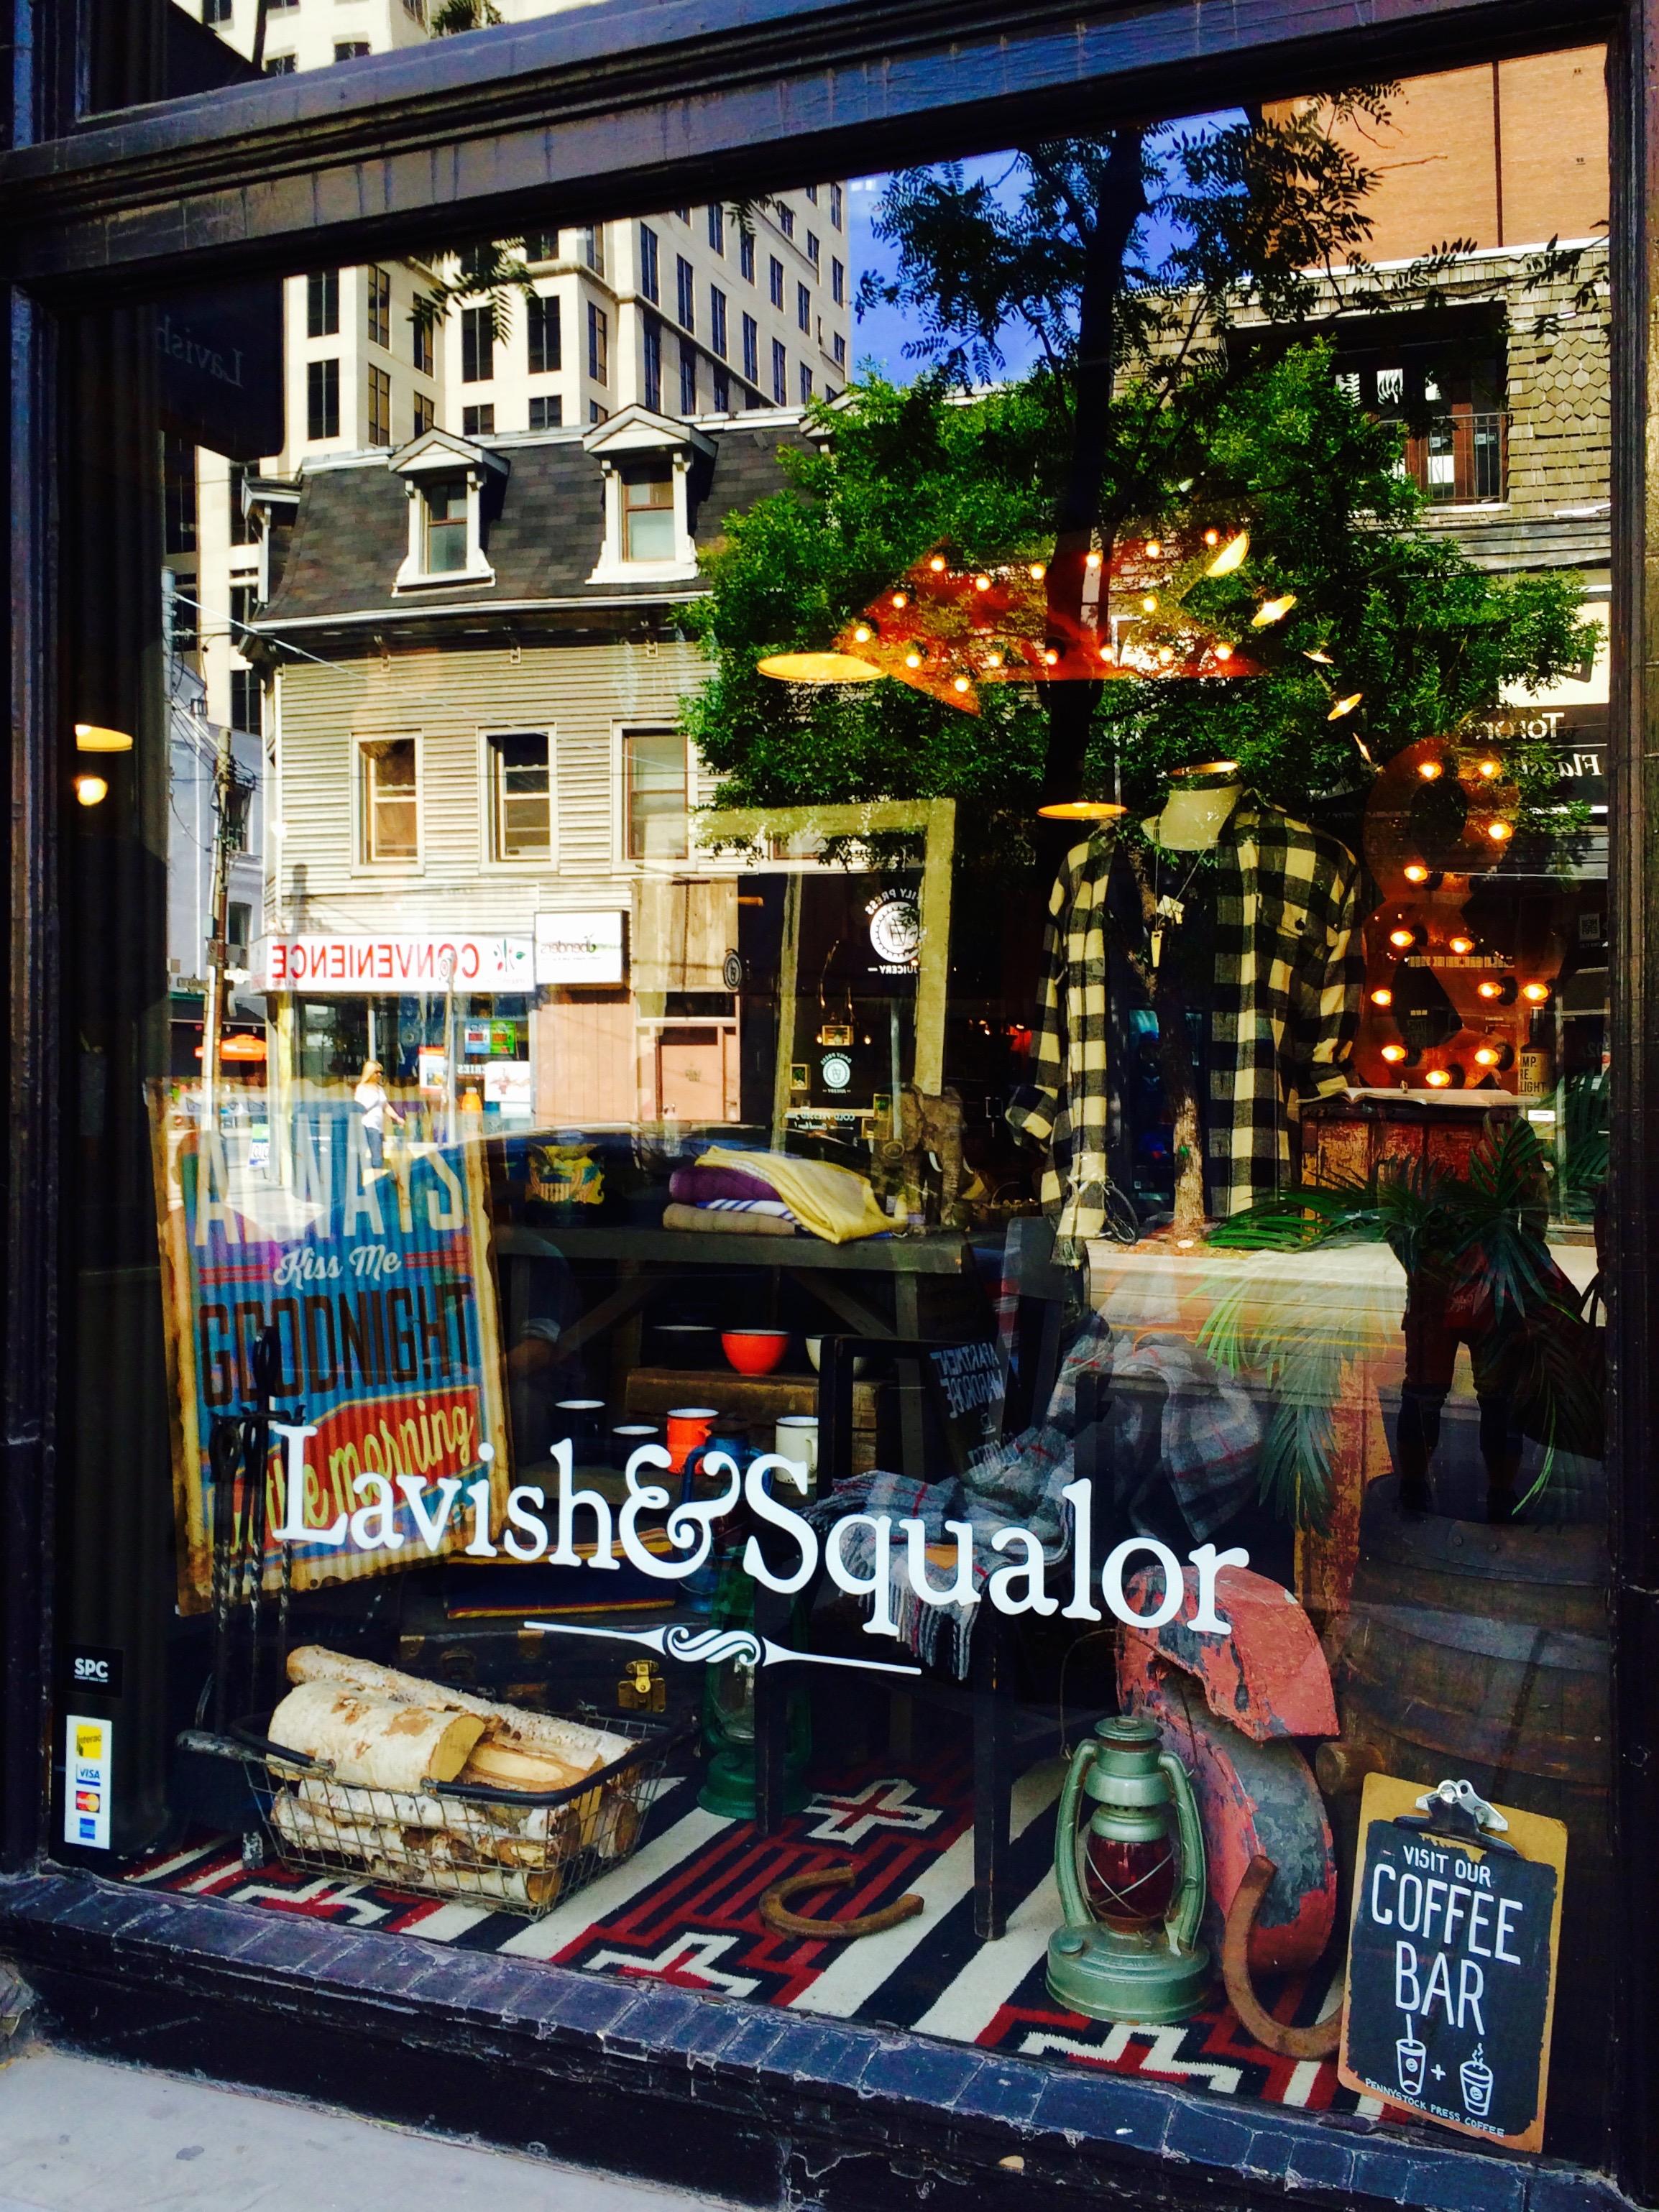 Lavish & Squalor Shop, Toronto Canada - 3 Days*